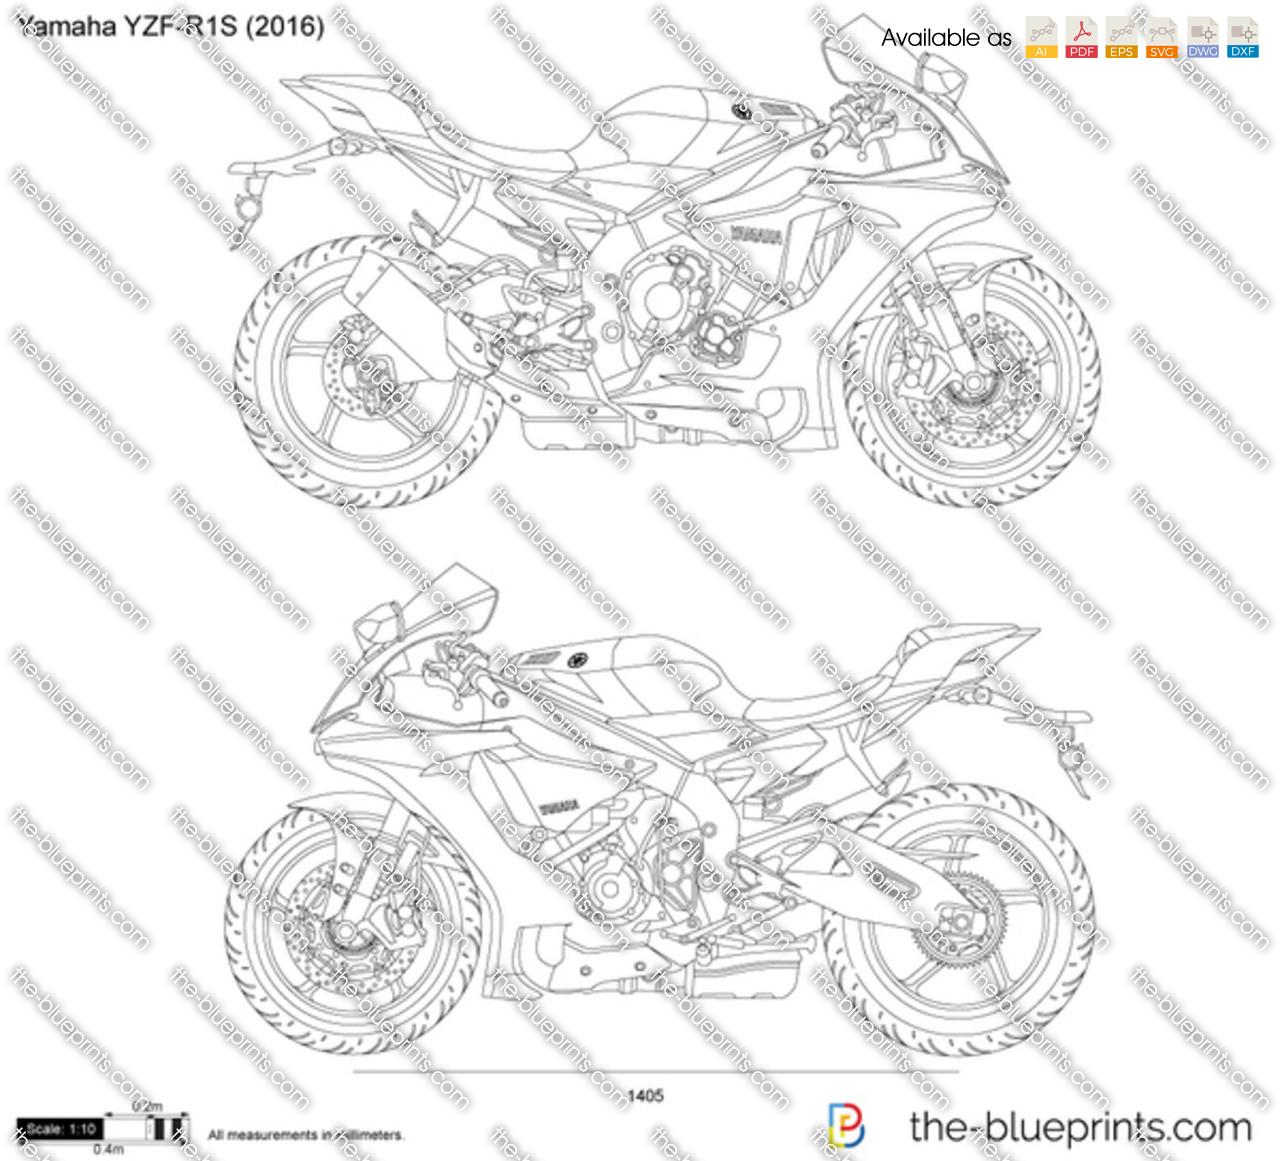 Yamaha YZF-R1S 2017